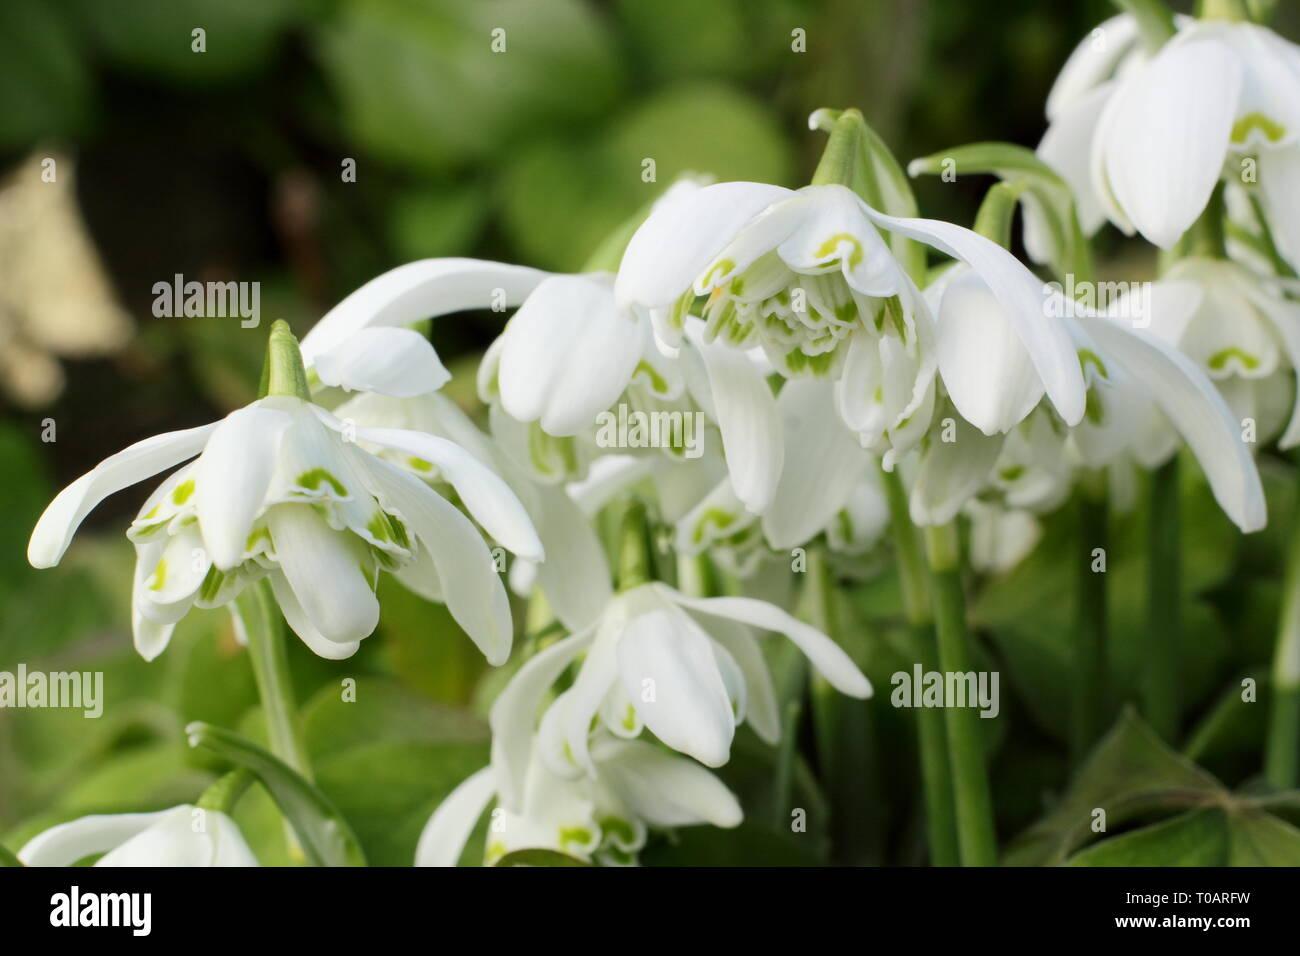 Galanthus nivalis f. pleniflorus 'Flore Pleno'. Fragrant blooms of 'Flore Pleno' snowdrops in a UK garden - February, UK. AGM - Stock Image